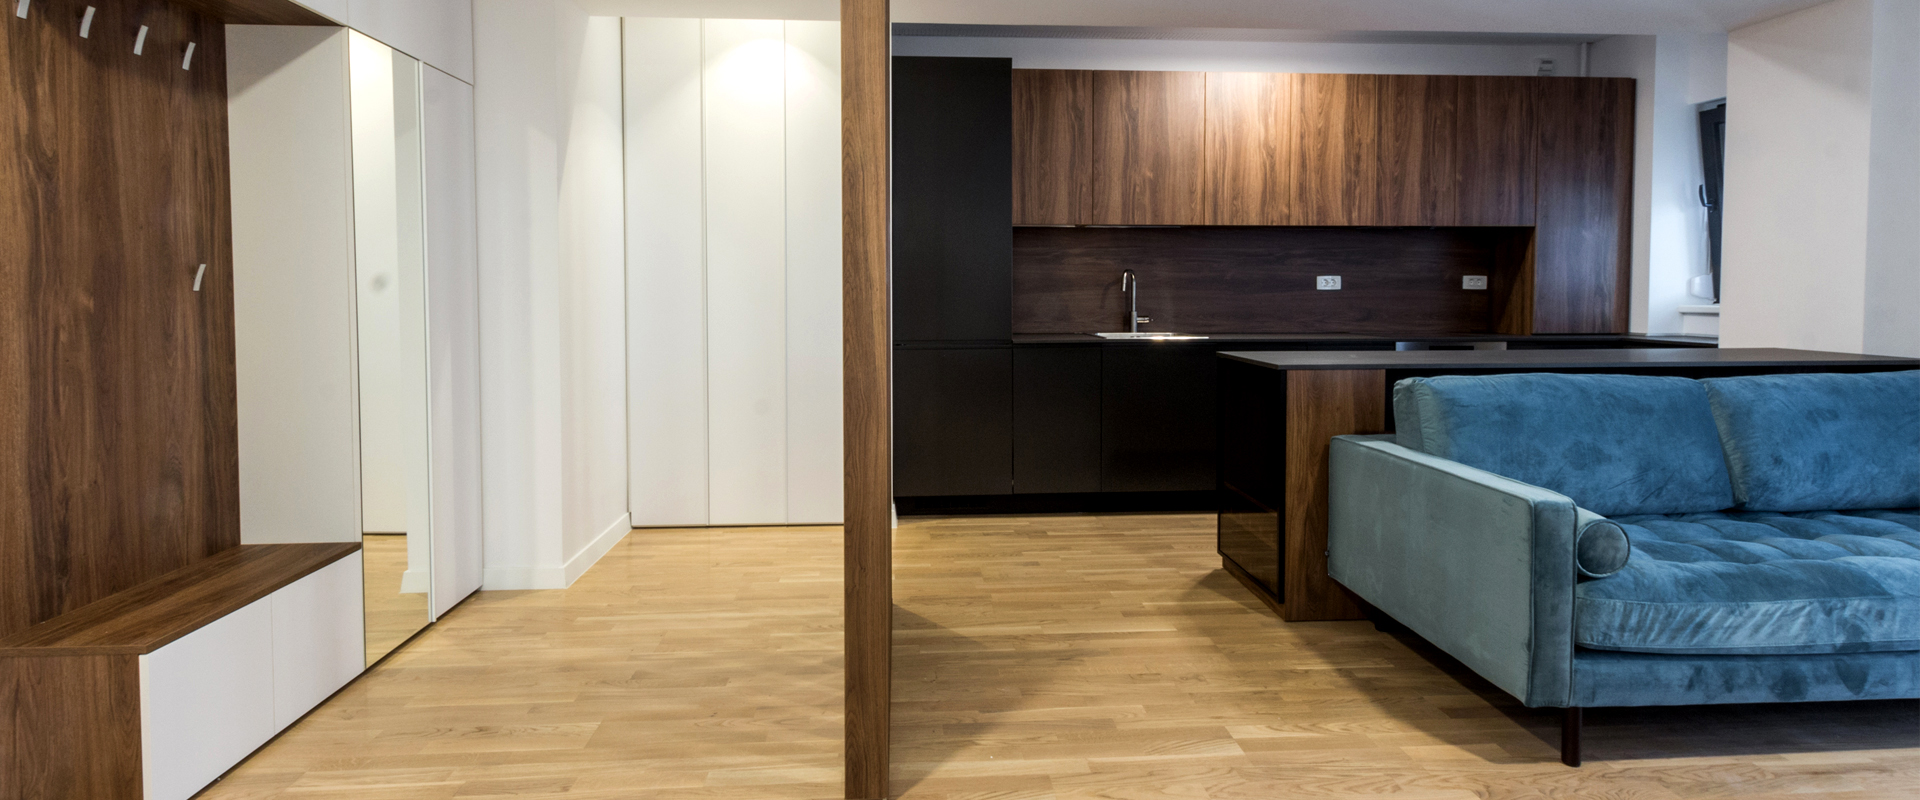 Inchiriere apartament 2 camere   Nou   Complex Arcadia, Domenii [ID: 1024297]